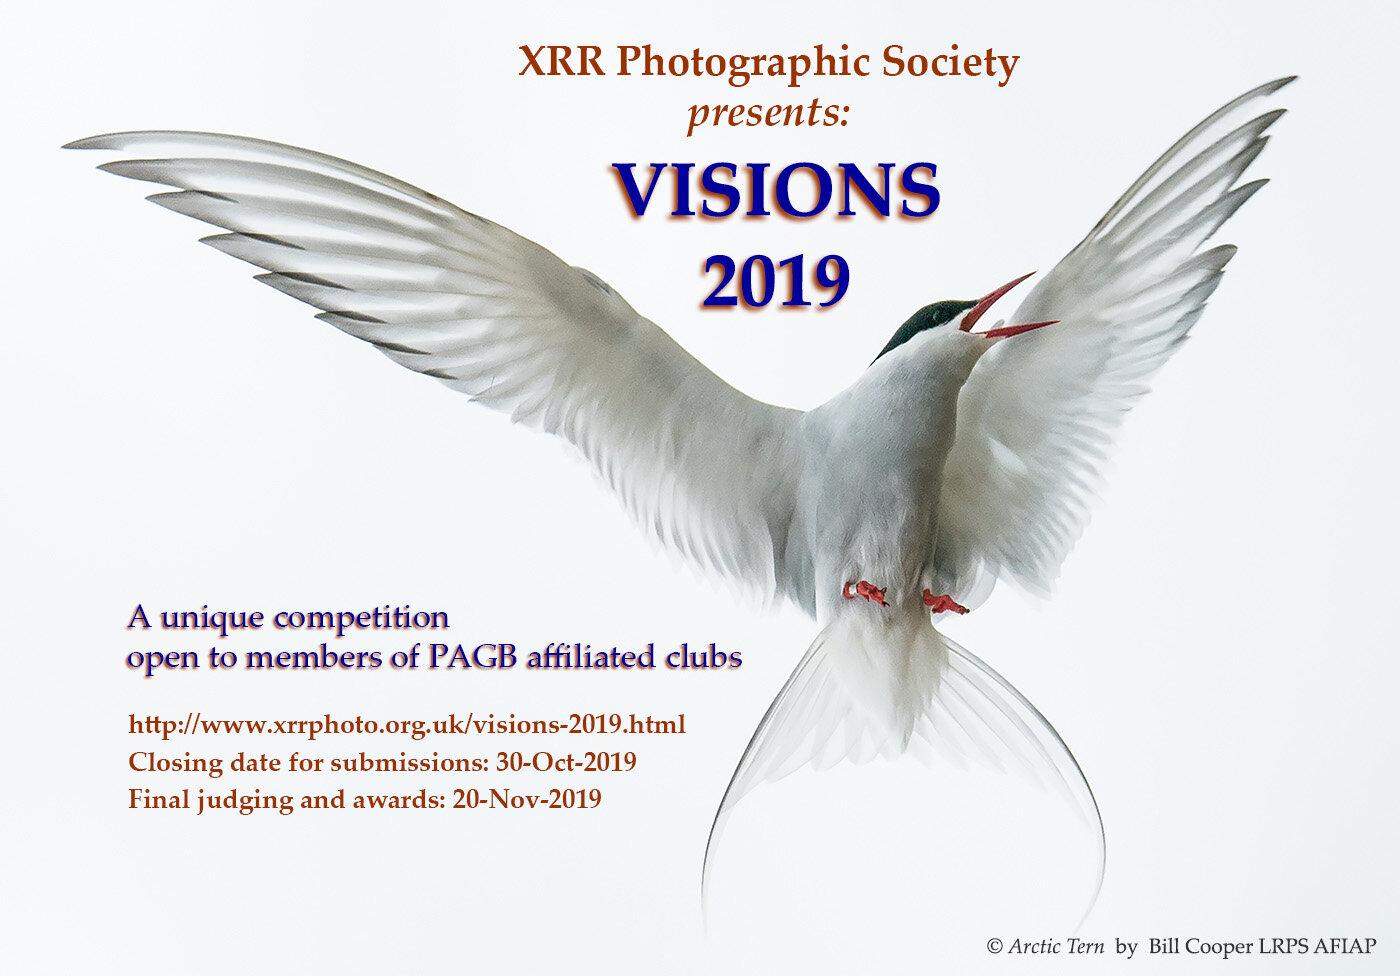 VISIONS 2019 Flyer.jpg